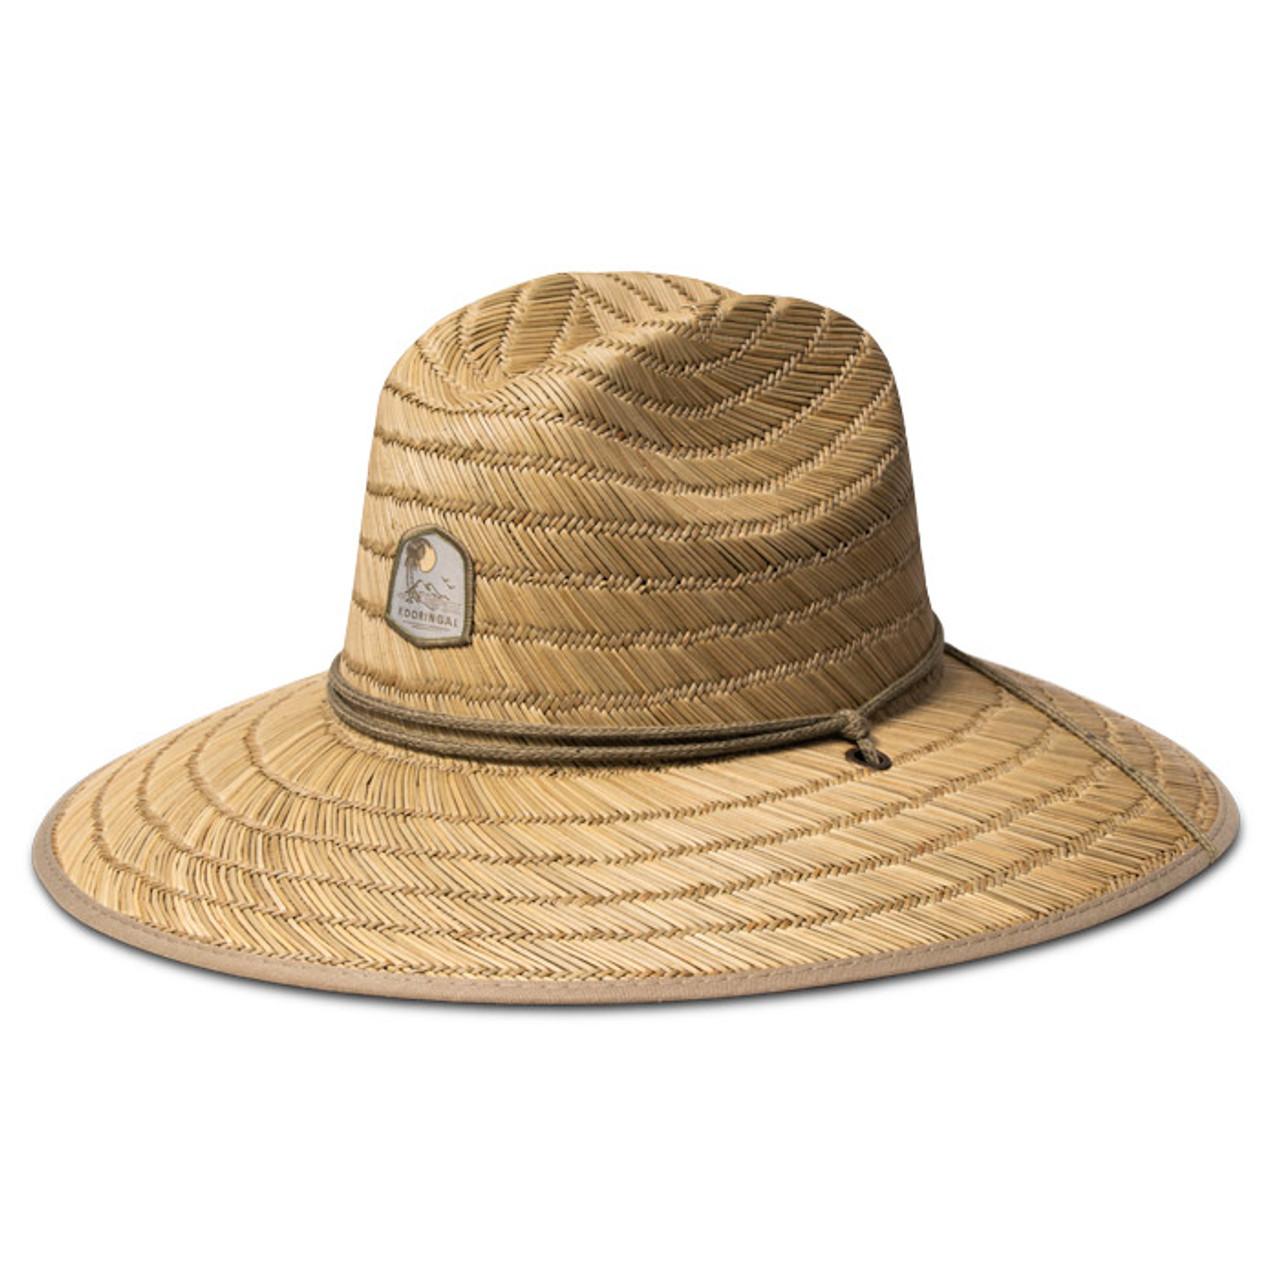 0d3a643e8 Kooringal - Hastings Surf Straw Lifeguard Hat